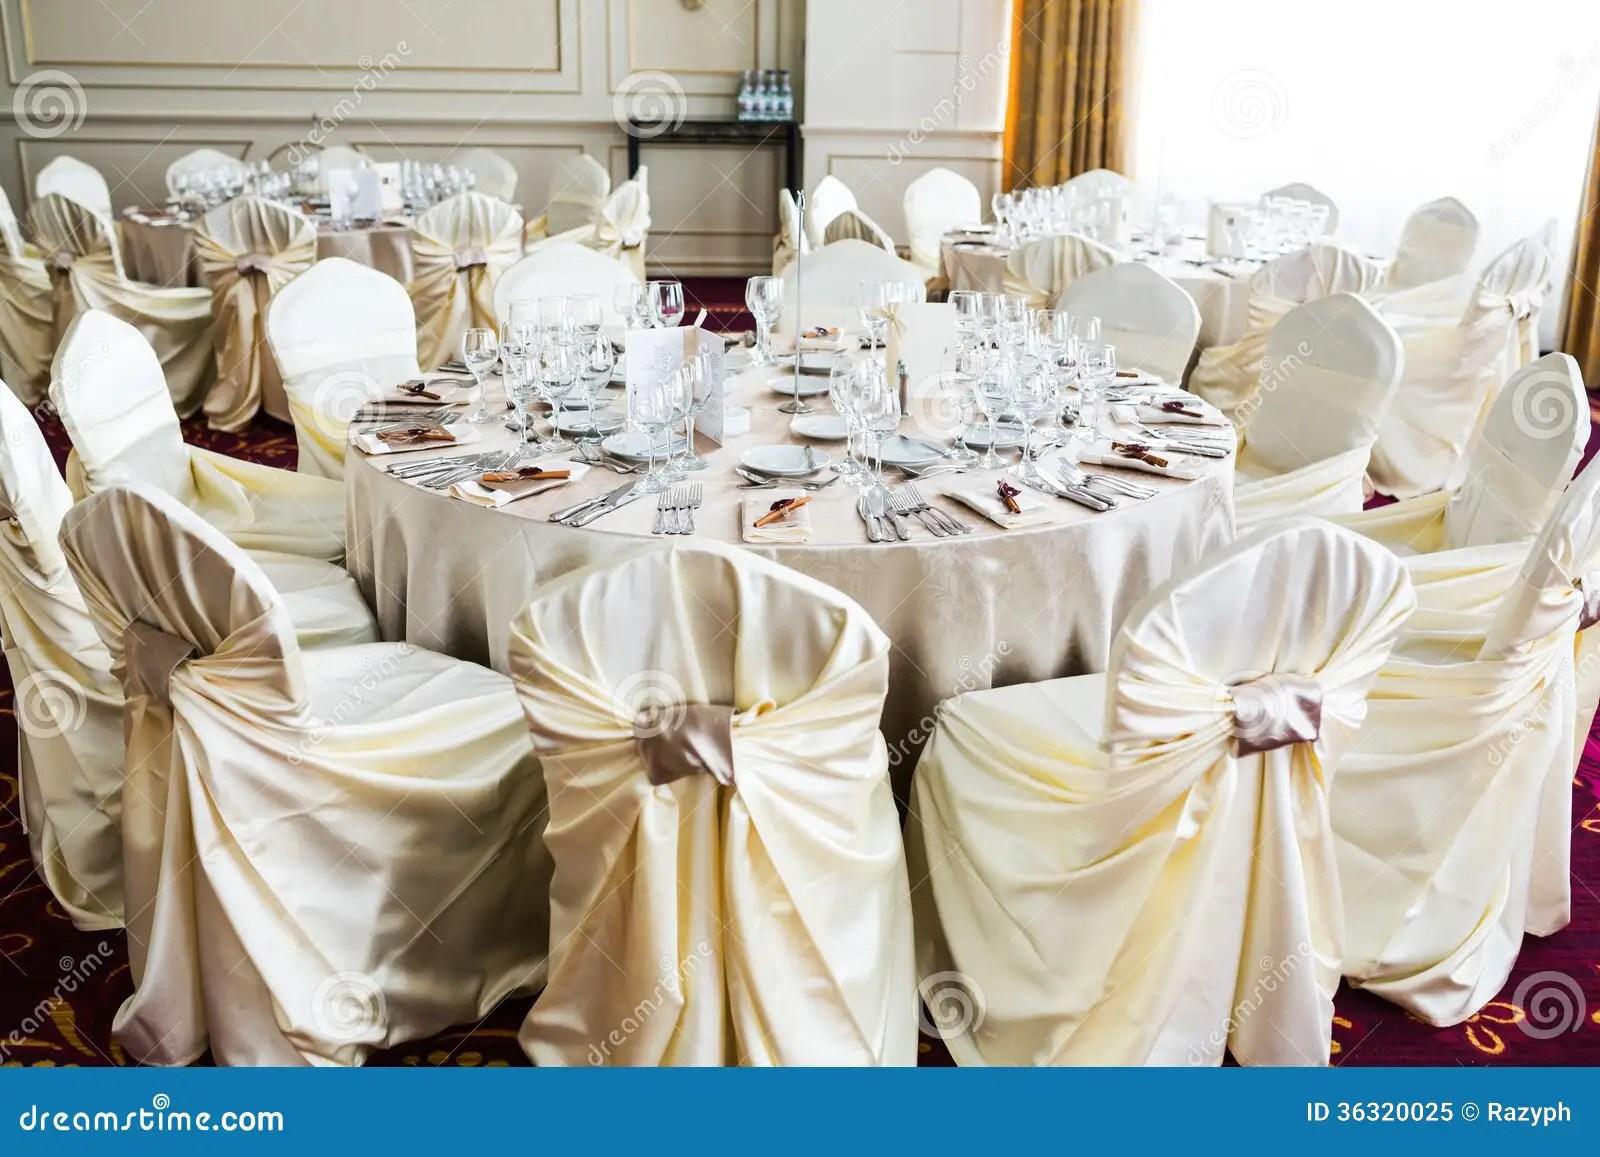 Romantic Wedding Setting Royalty Free Stock Photo  Image